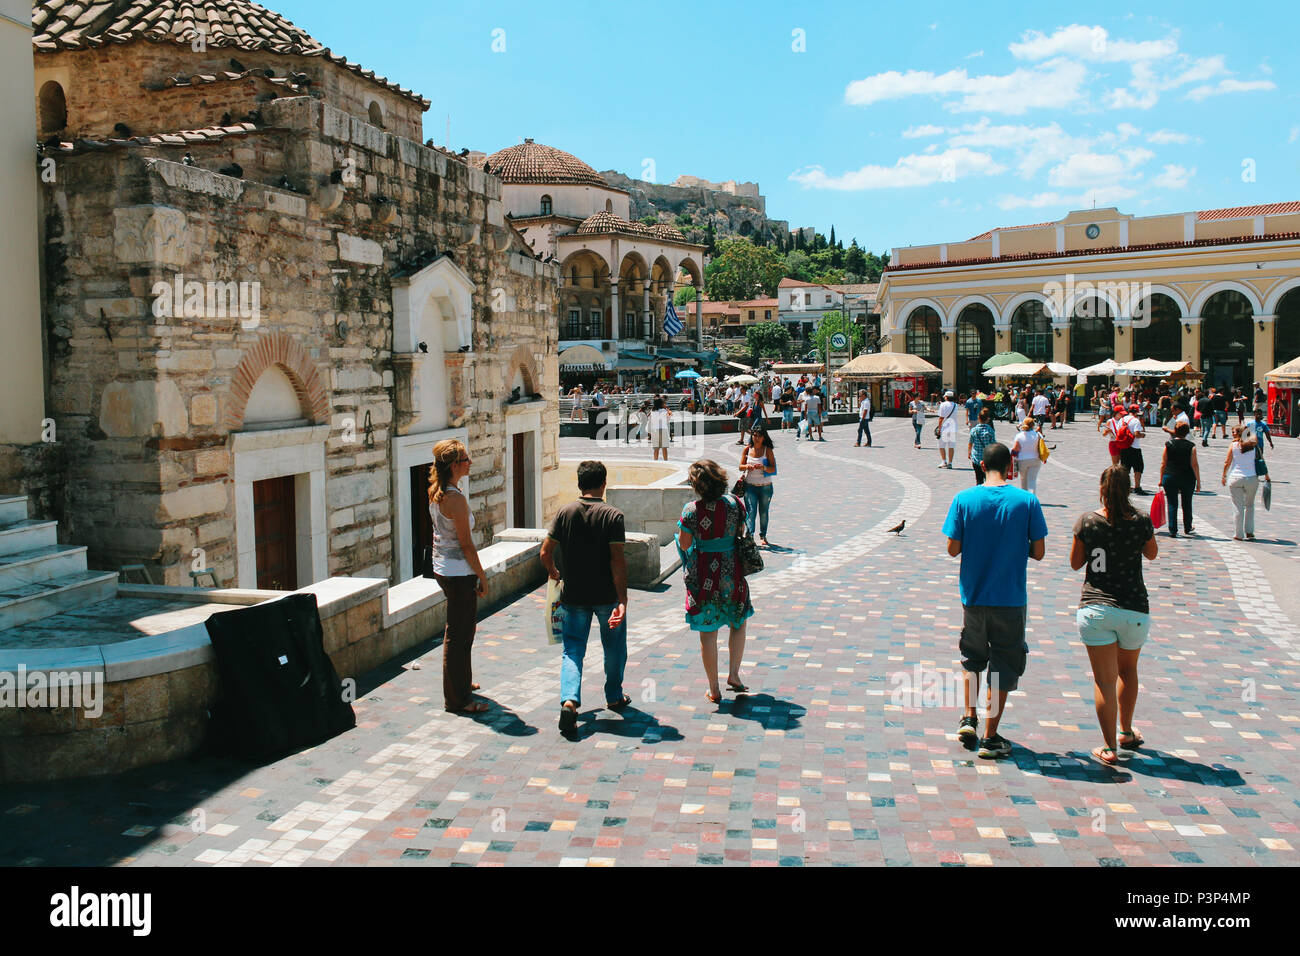 Athens, Greece - July 23, 2013 : Monastiraki square with tourist people - Stock Image